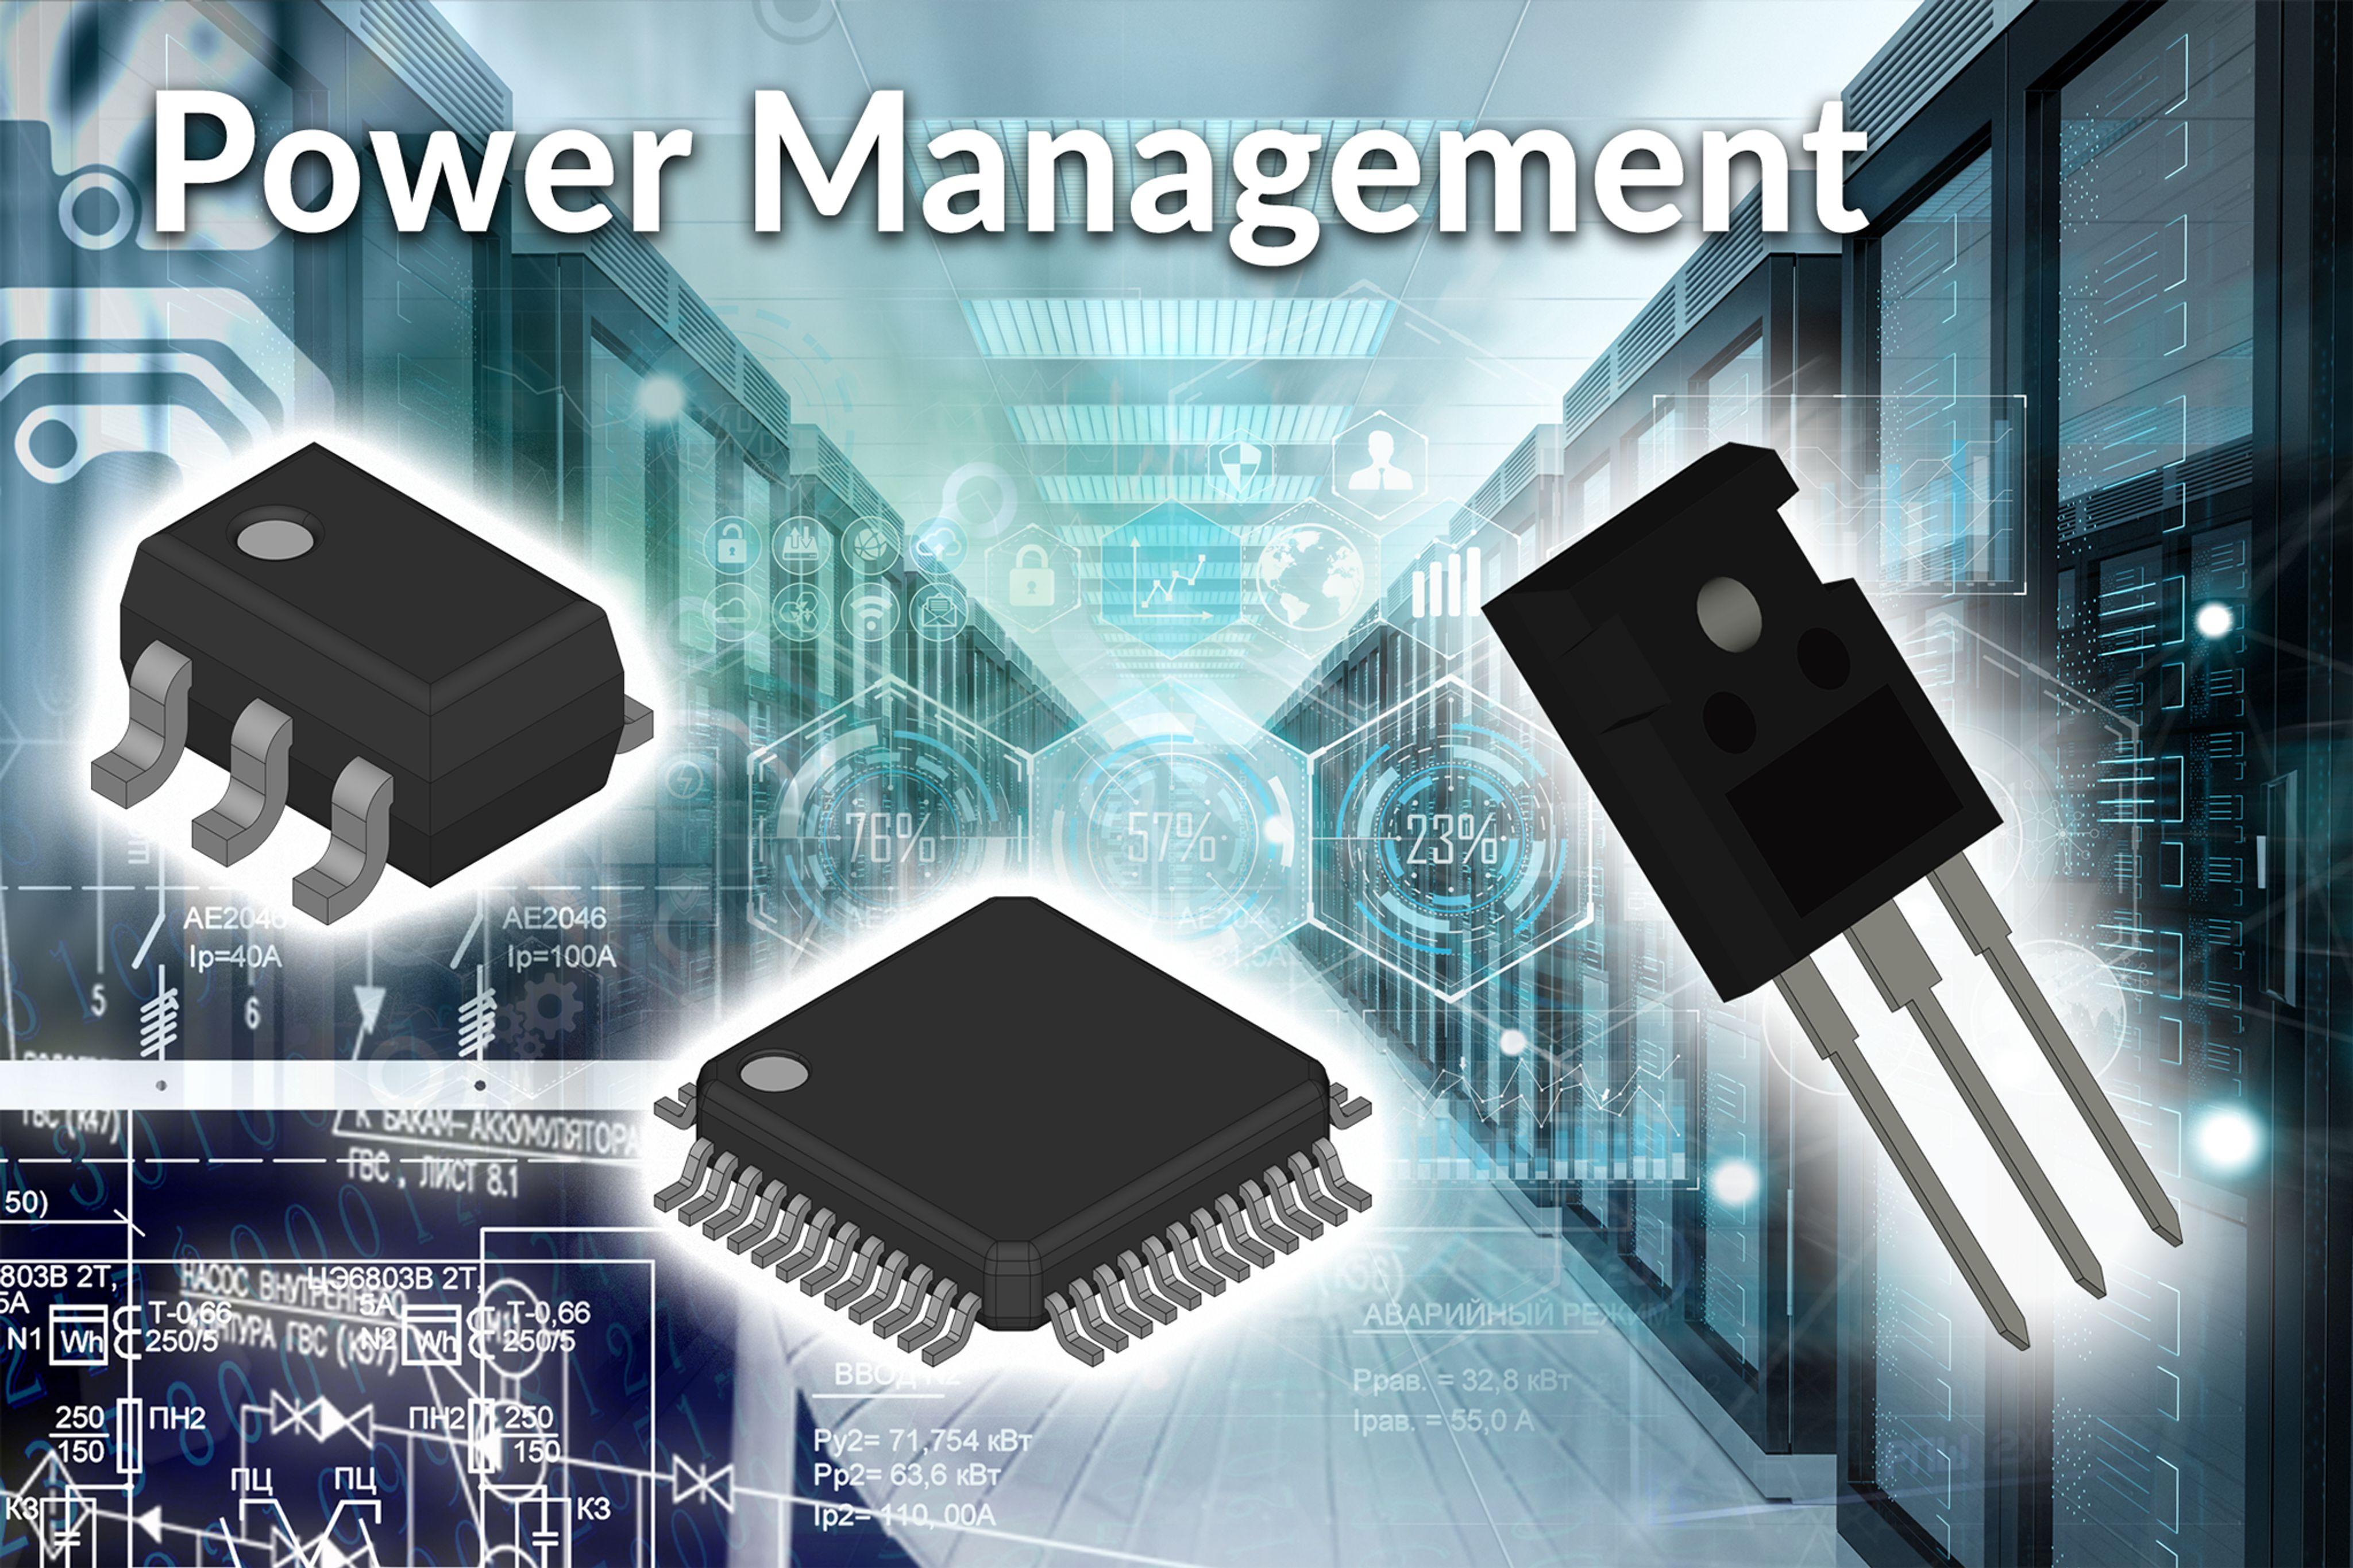 PowerManagement_External%20Email_FEB20